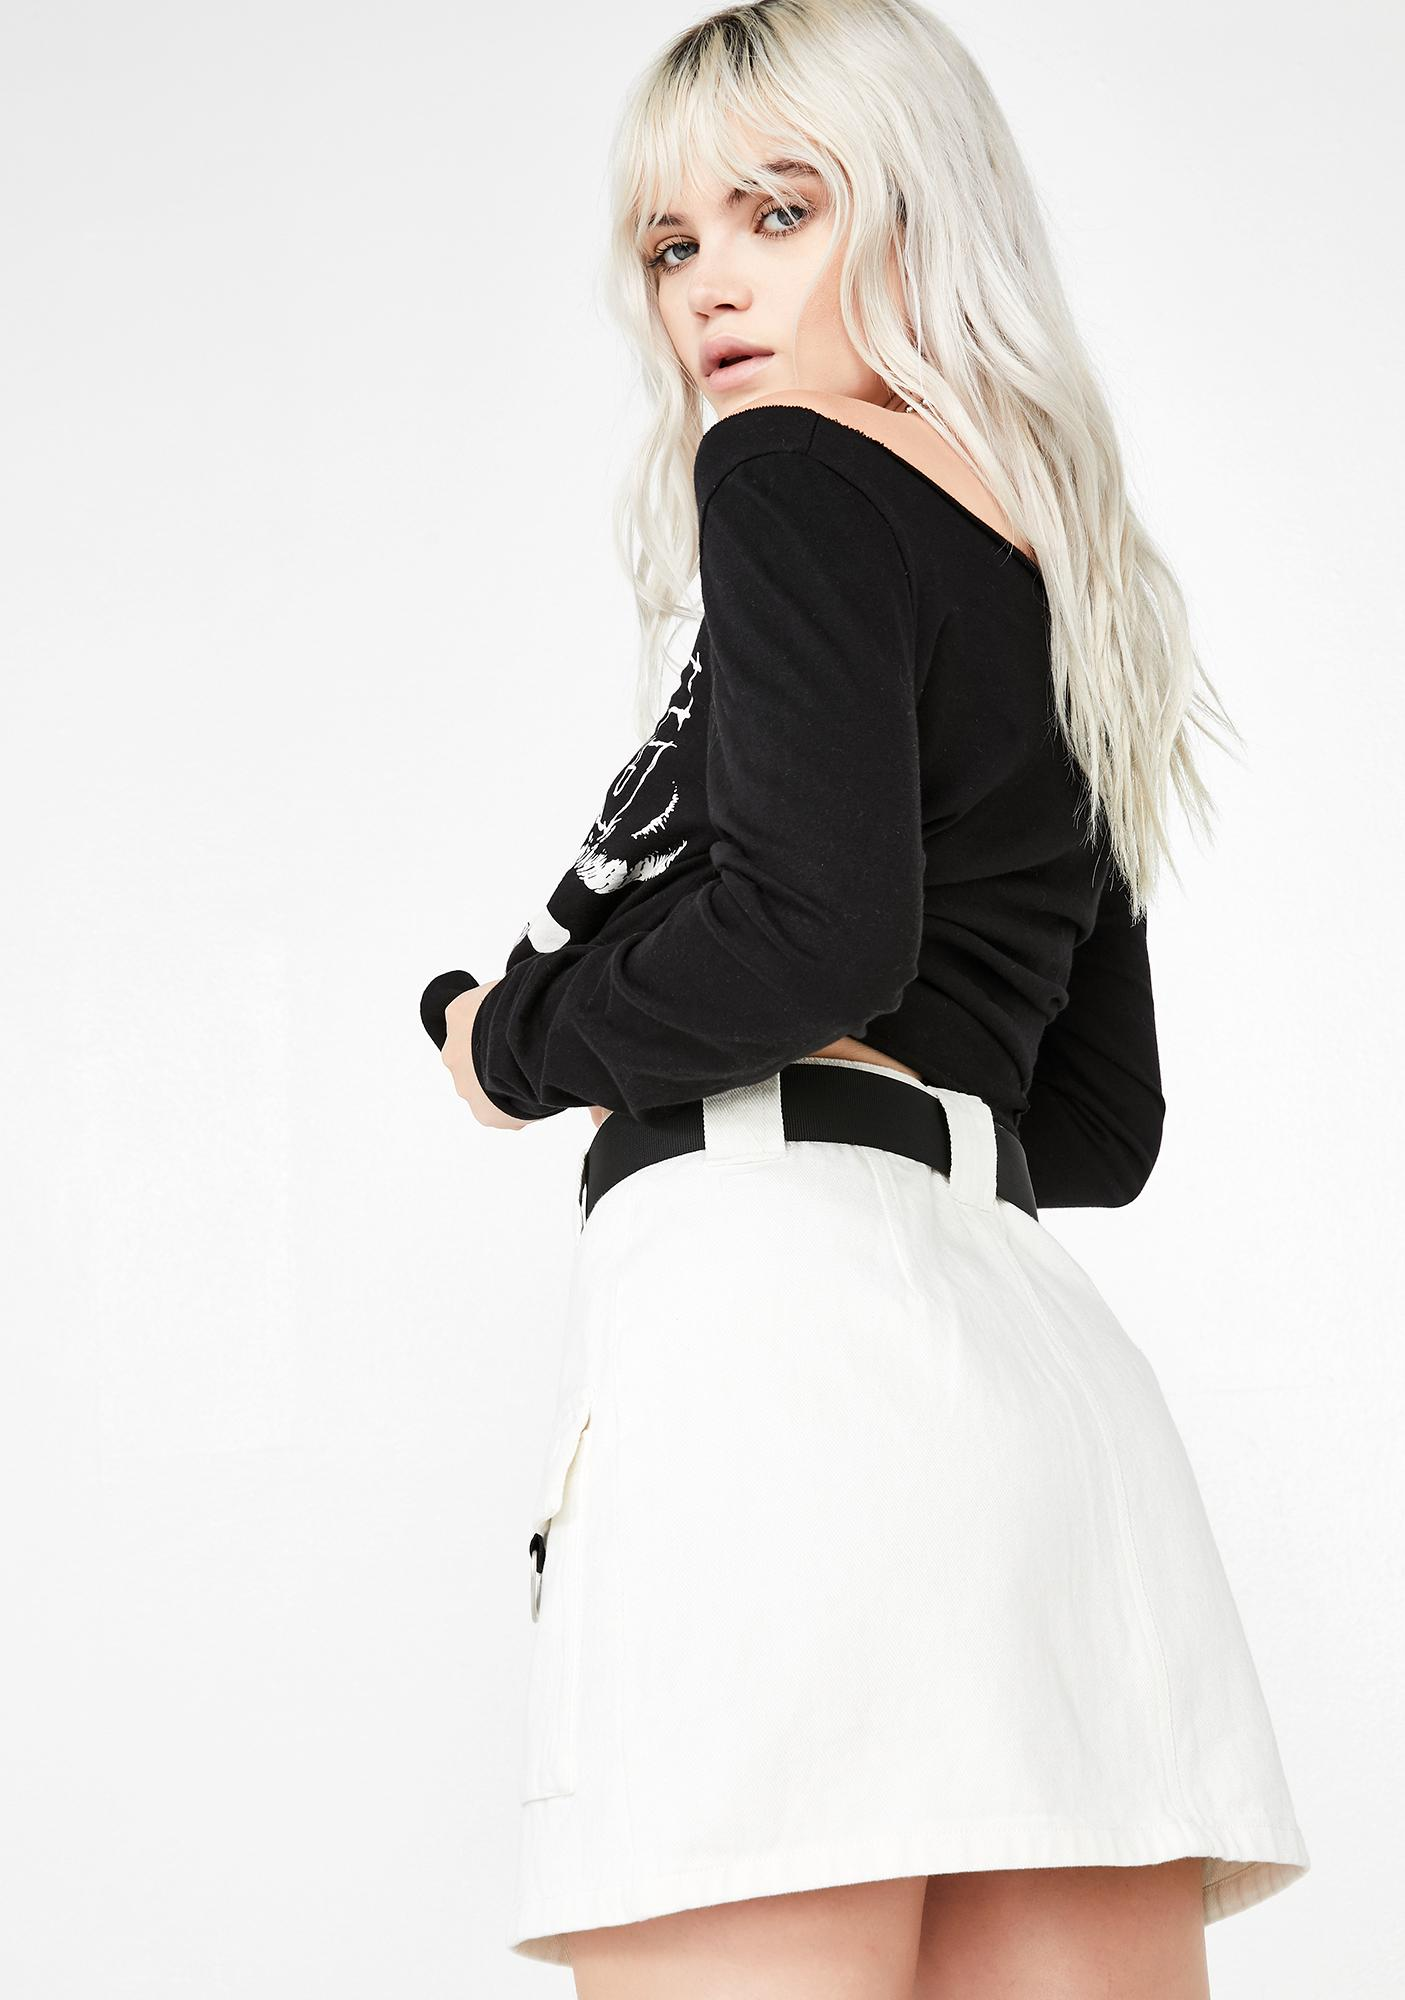 Icy Stop Frontin' Denim Skirt